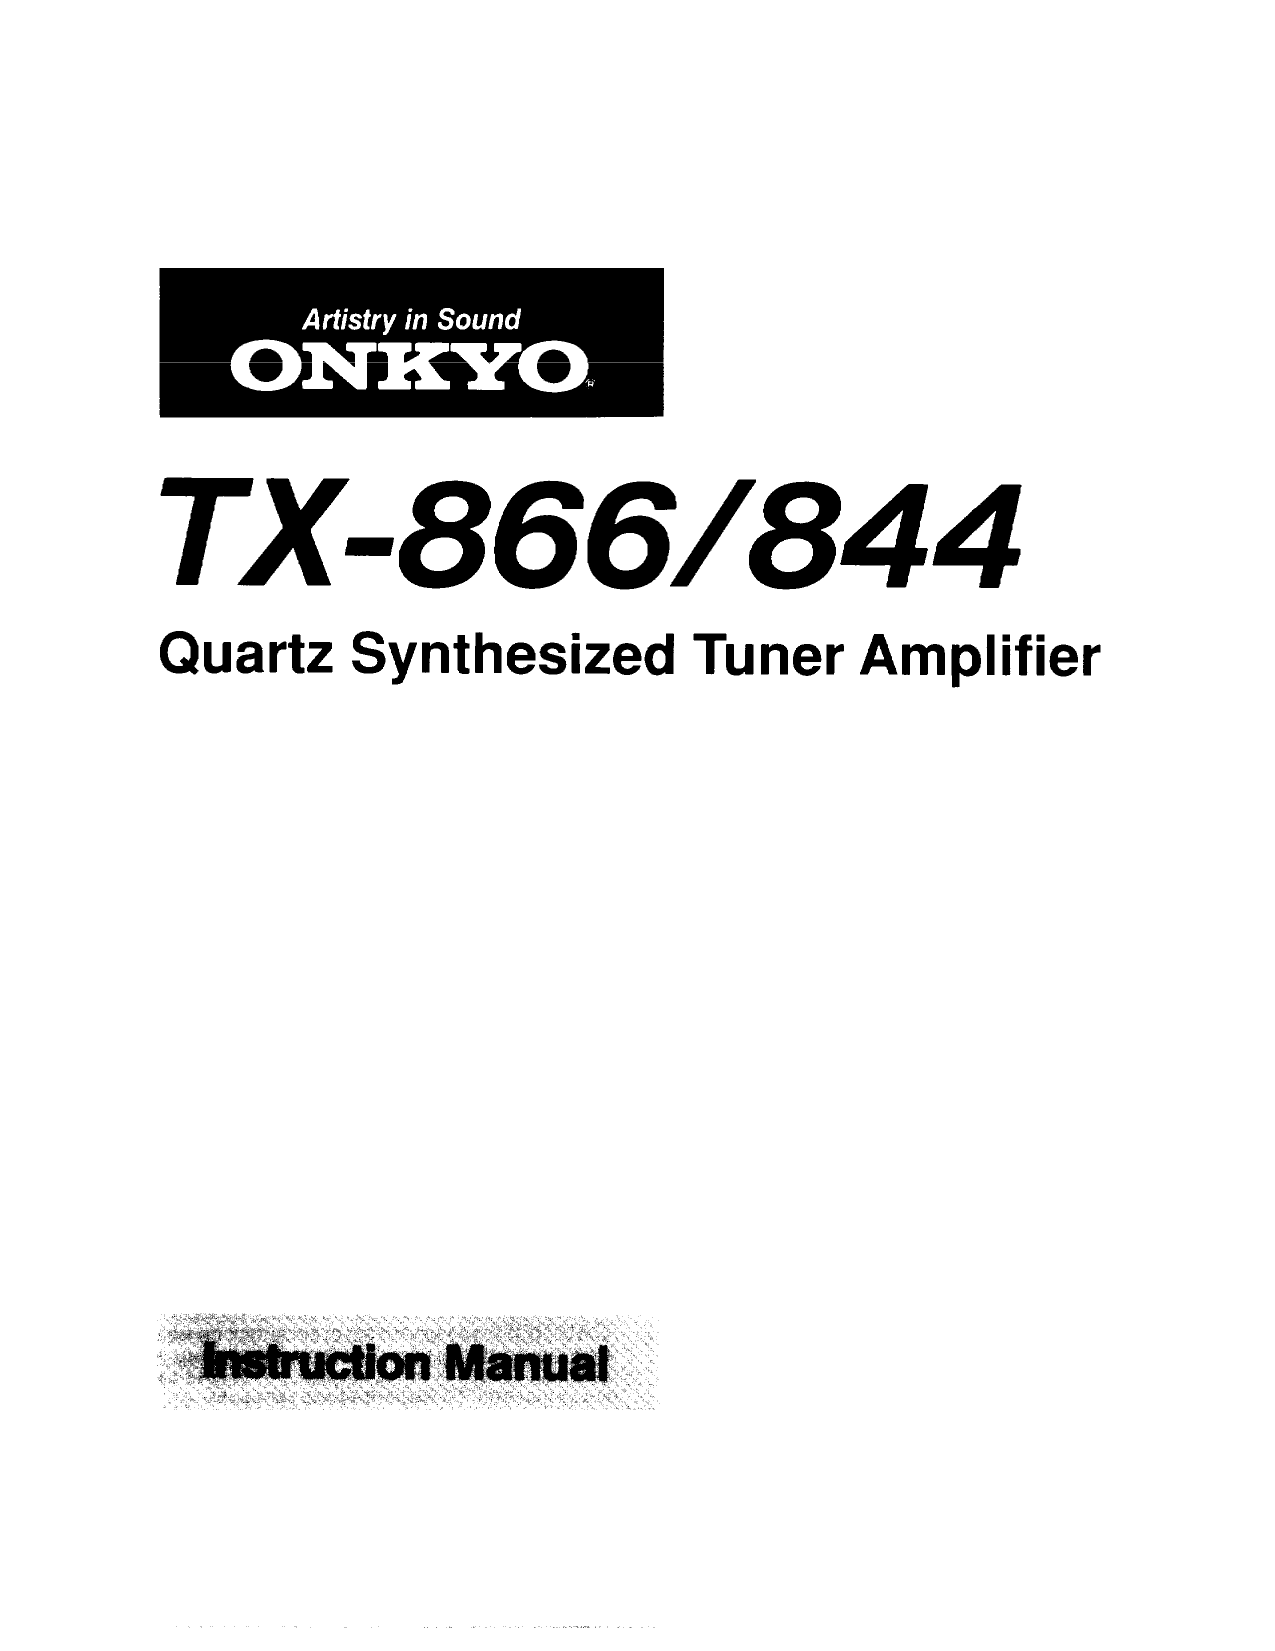 Download free pdf for Onkyo TX-866 Receiver manual